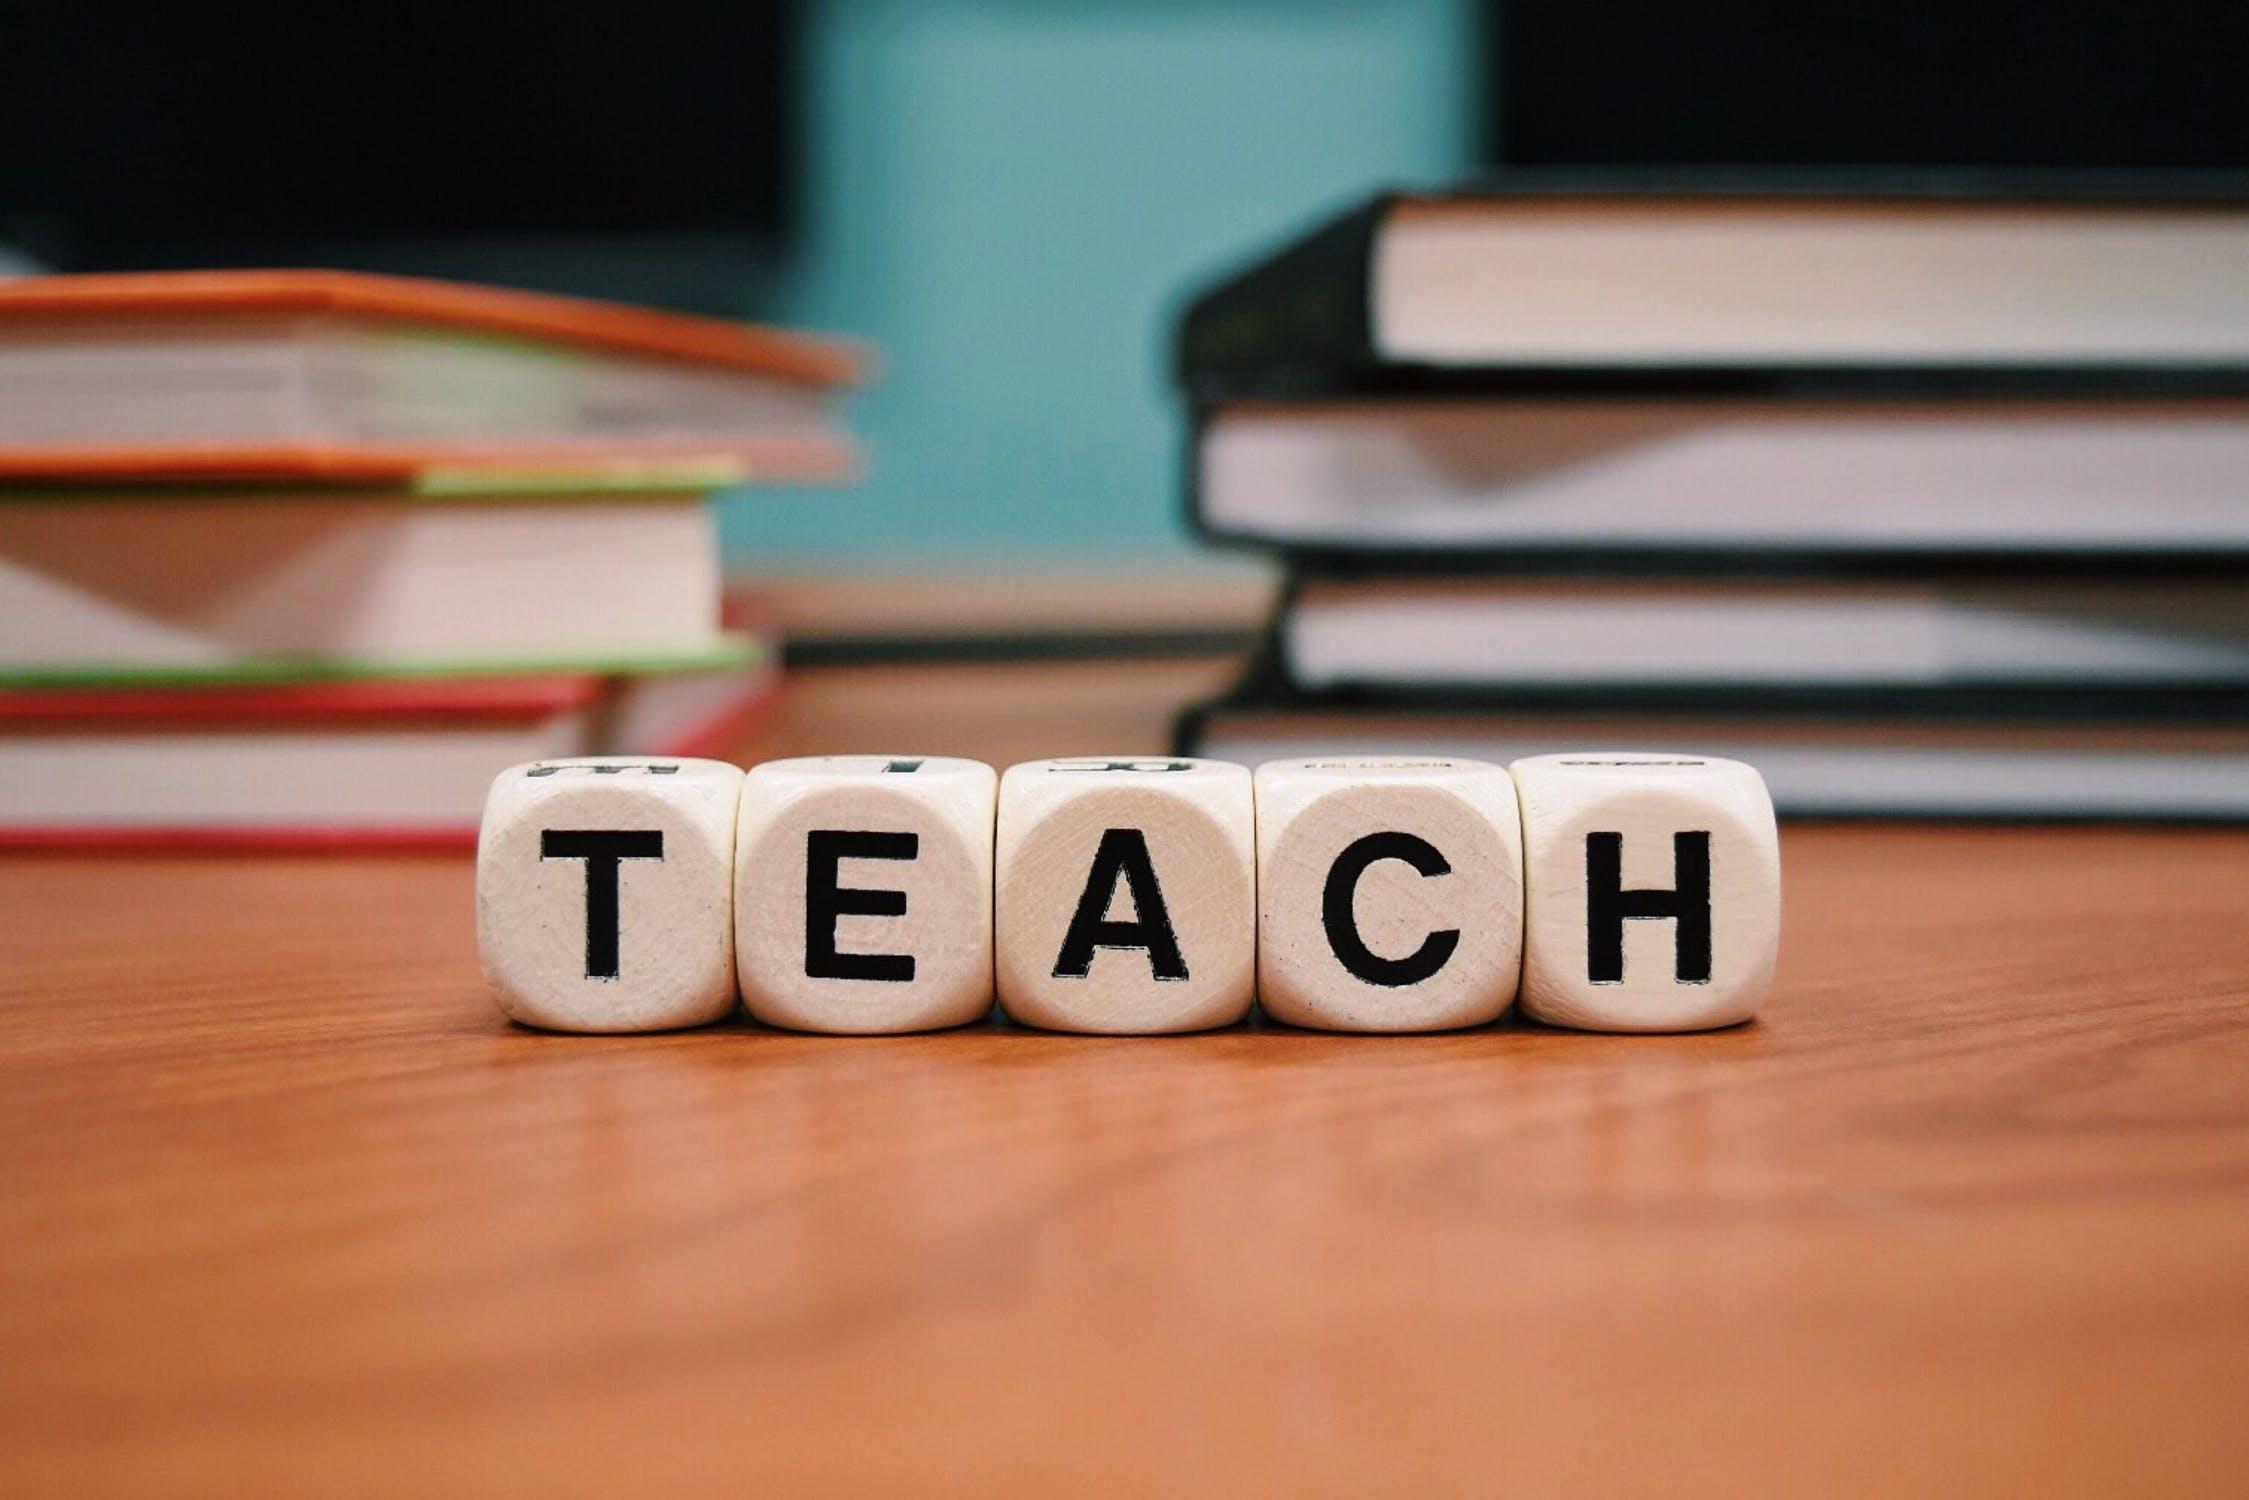 Why So Many Teachers Struggle With Mental Health